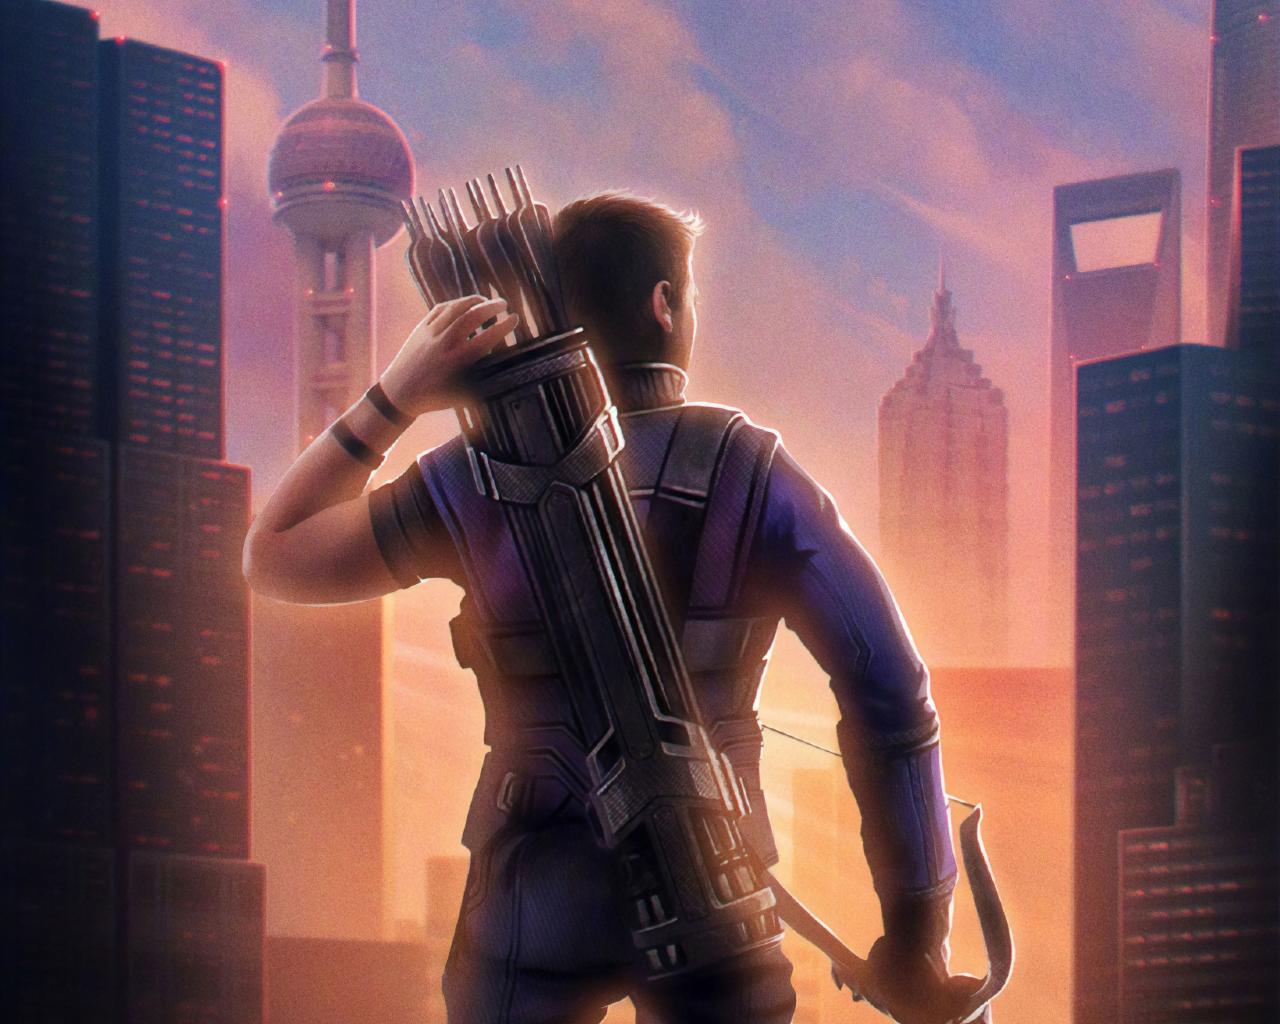 1280x1024 Hawkeye Avengers Endgame 1280x1024 Resolution Wallpaper 1280x1024